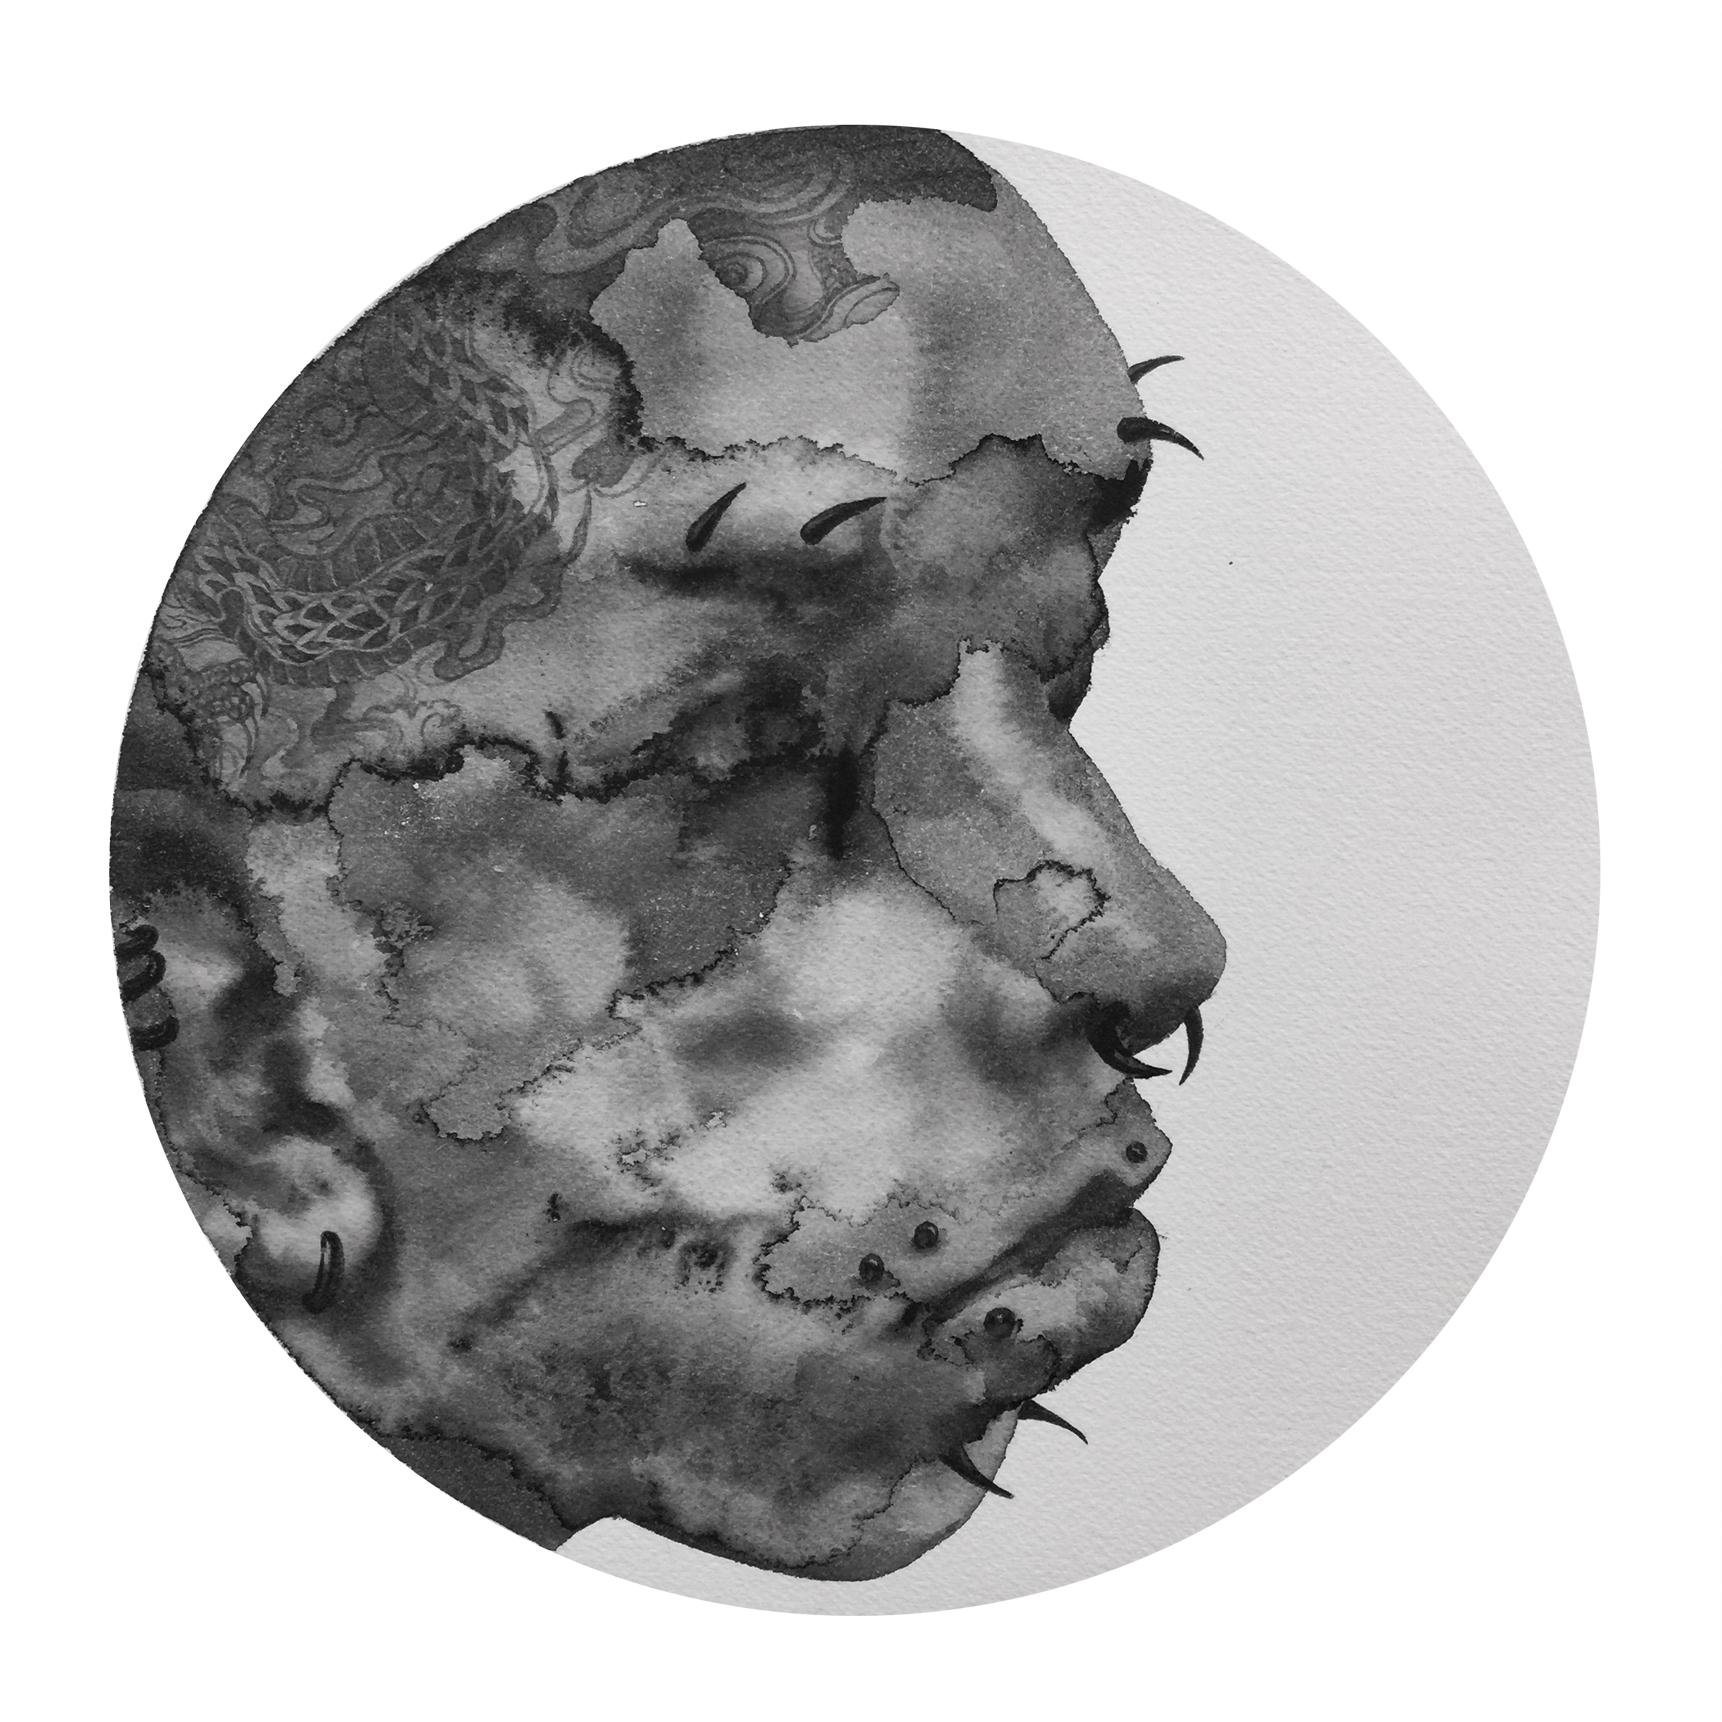 Reflection #2 (Contemporary Artist Shanlin Ye at Jim Kempner Fine Art)